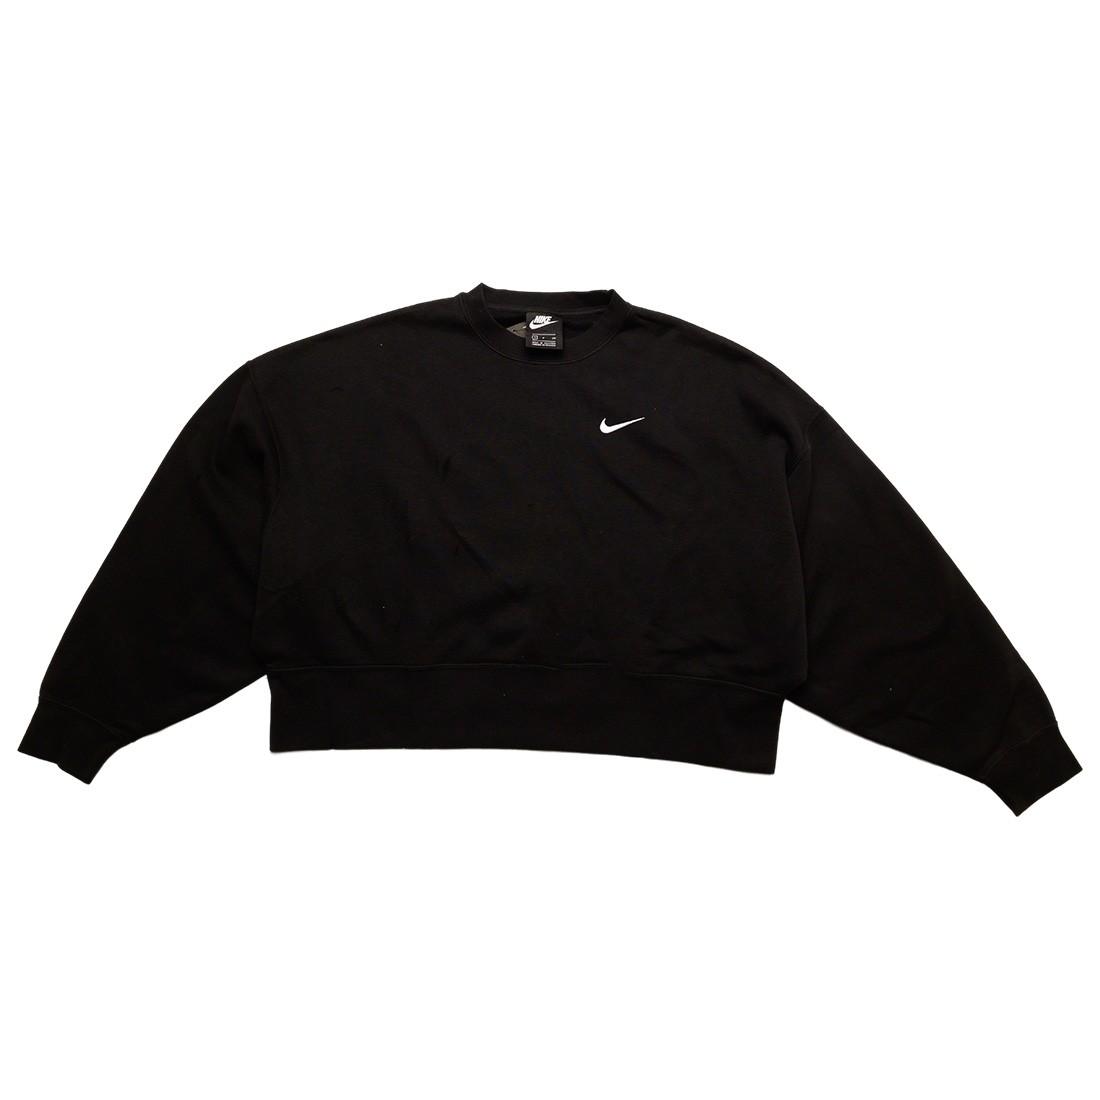 Nike Women Sportswear Essentials Crewneck (black / white)